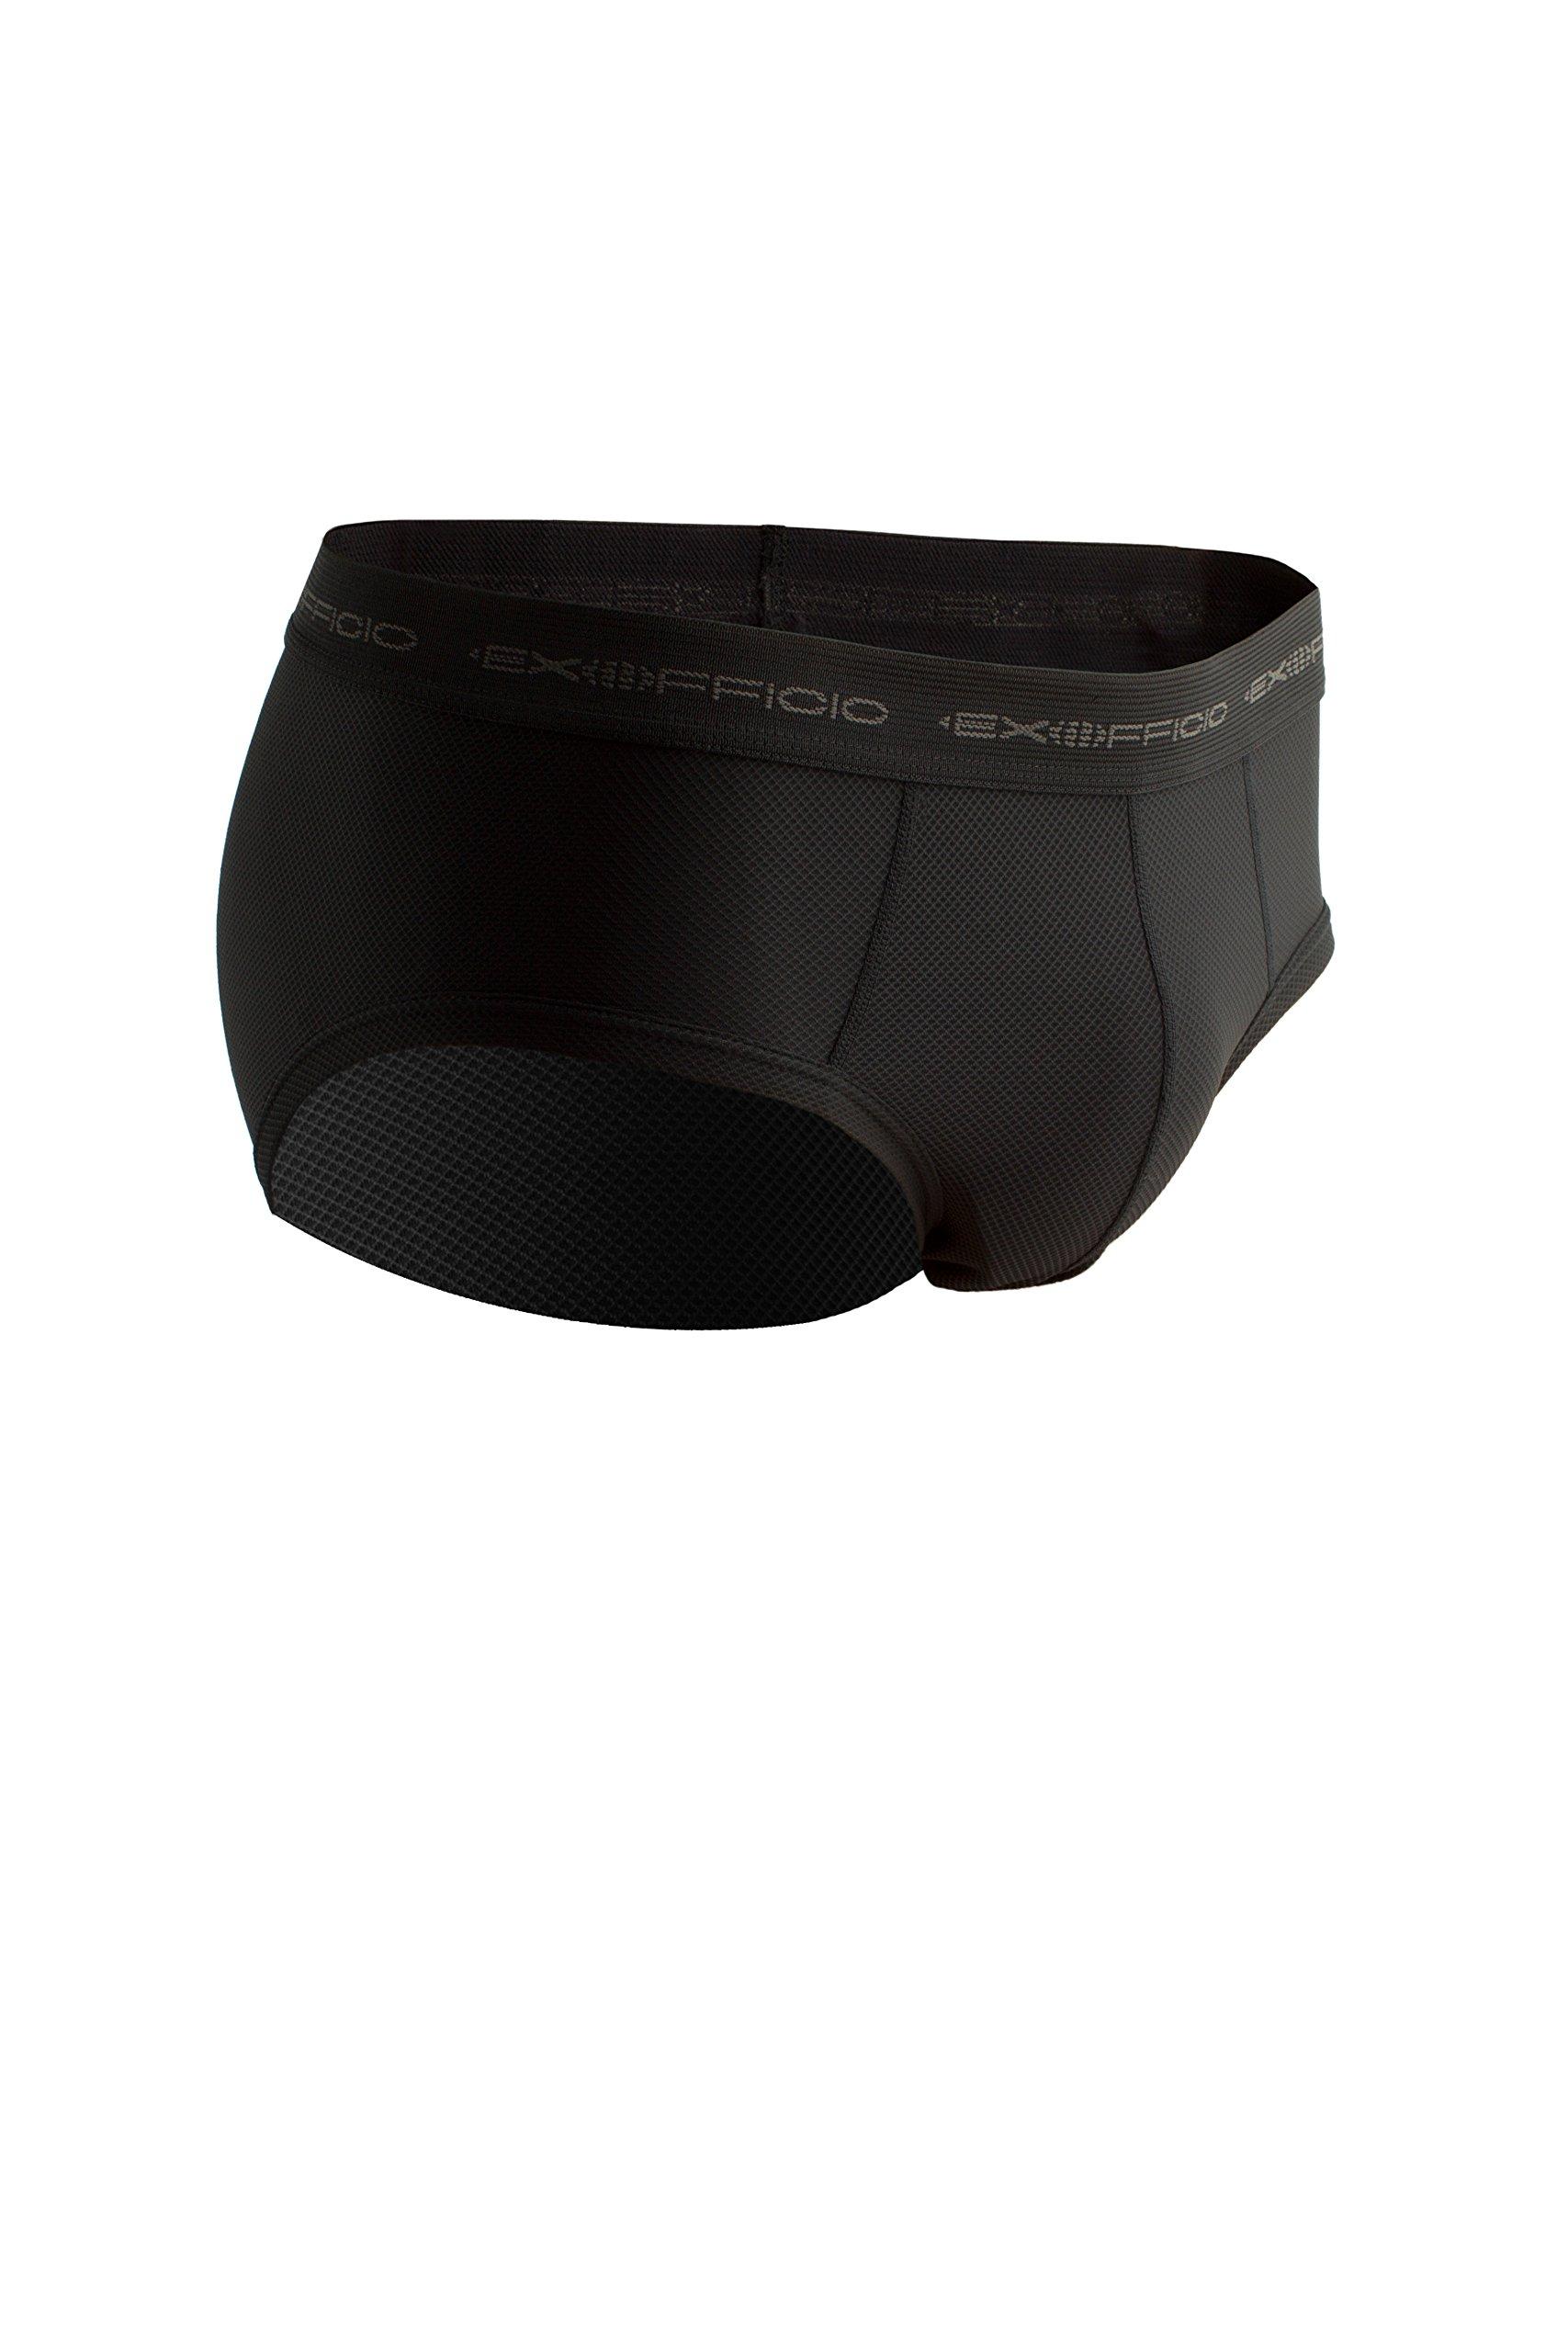 ExOfficio Men's Give-N-Go Flyless Brief, Black, Large